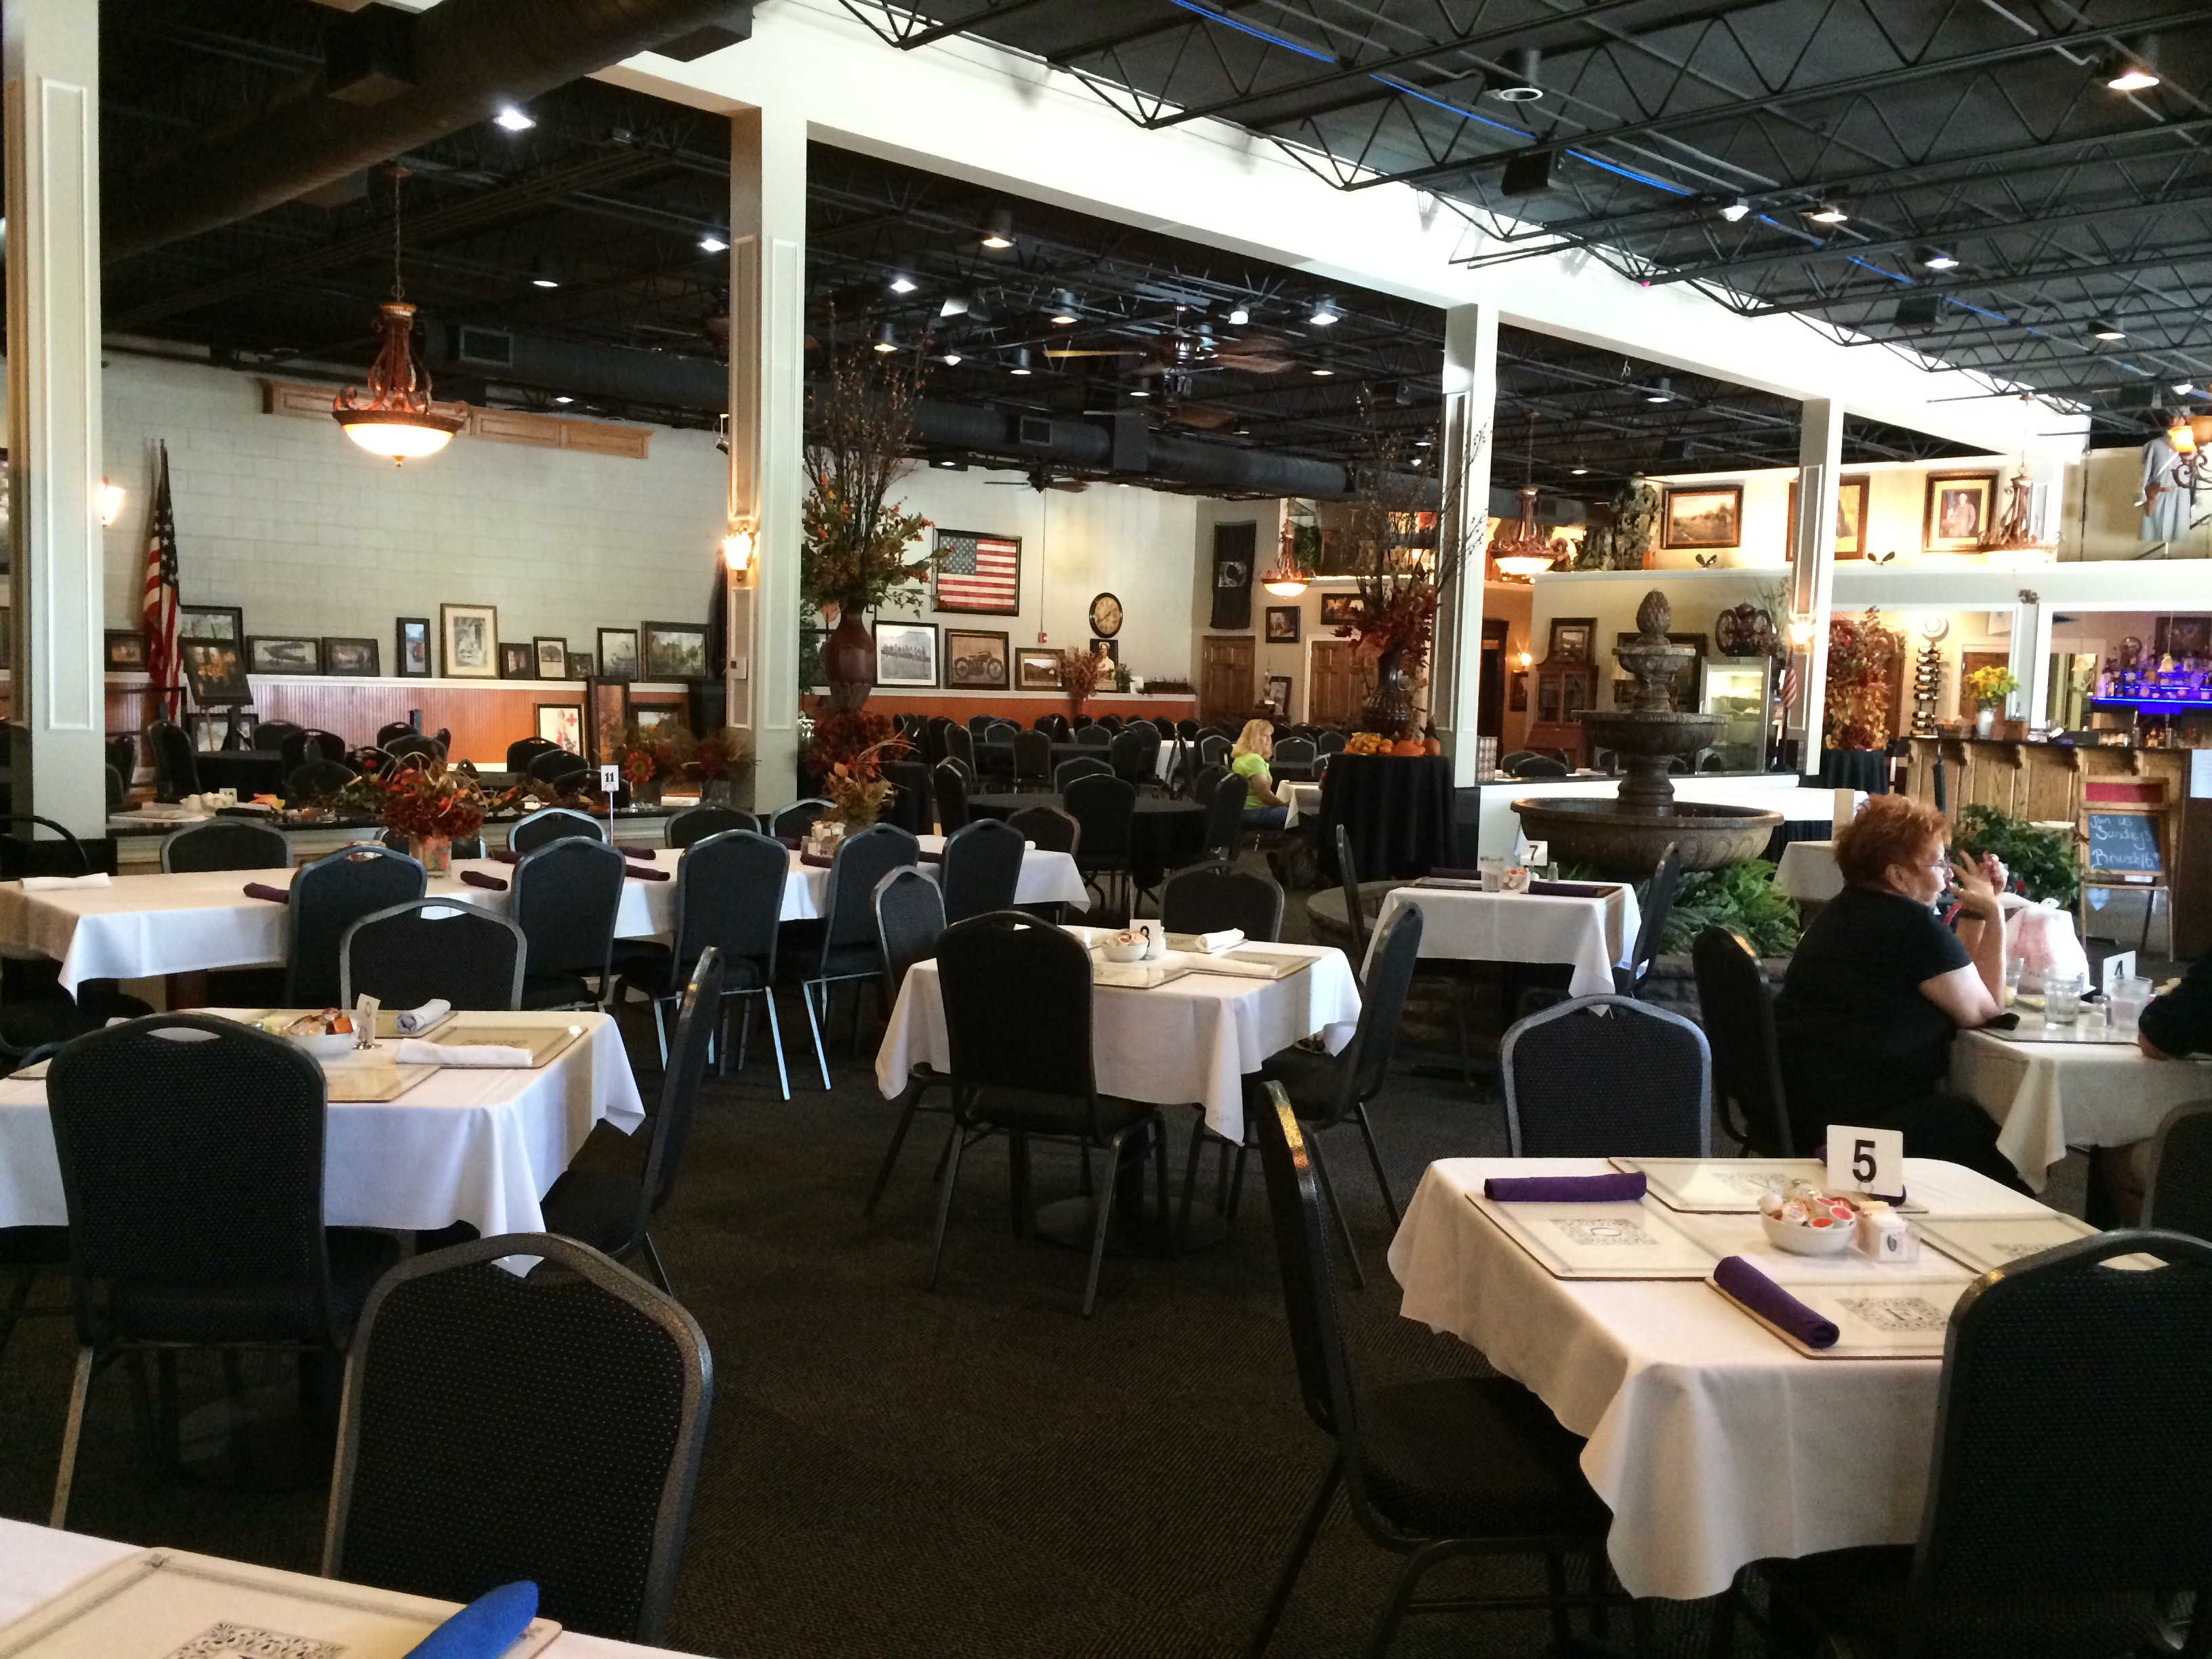 June's Northland Restaurant & Banquet Facility, Leavenworth KS